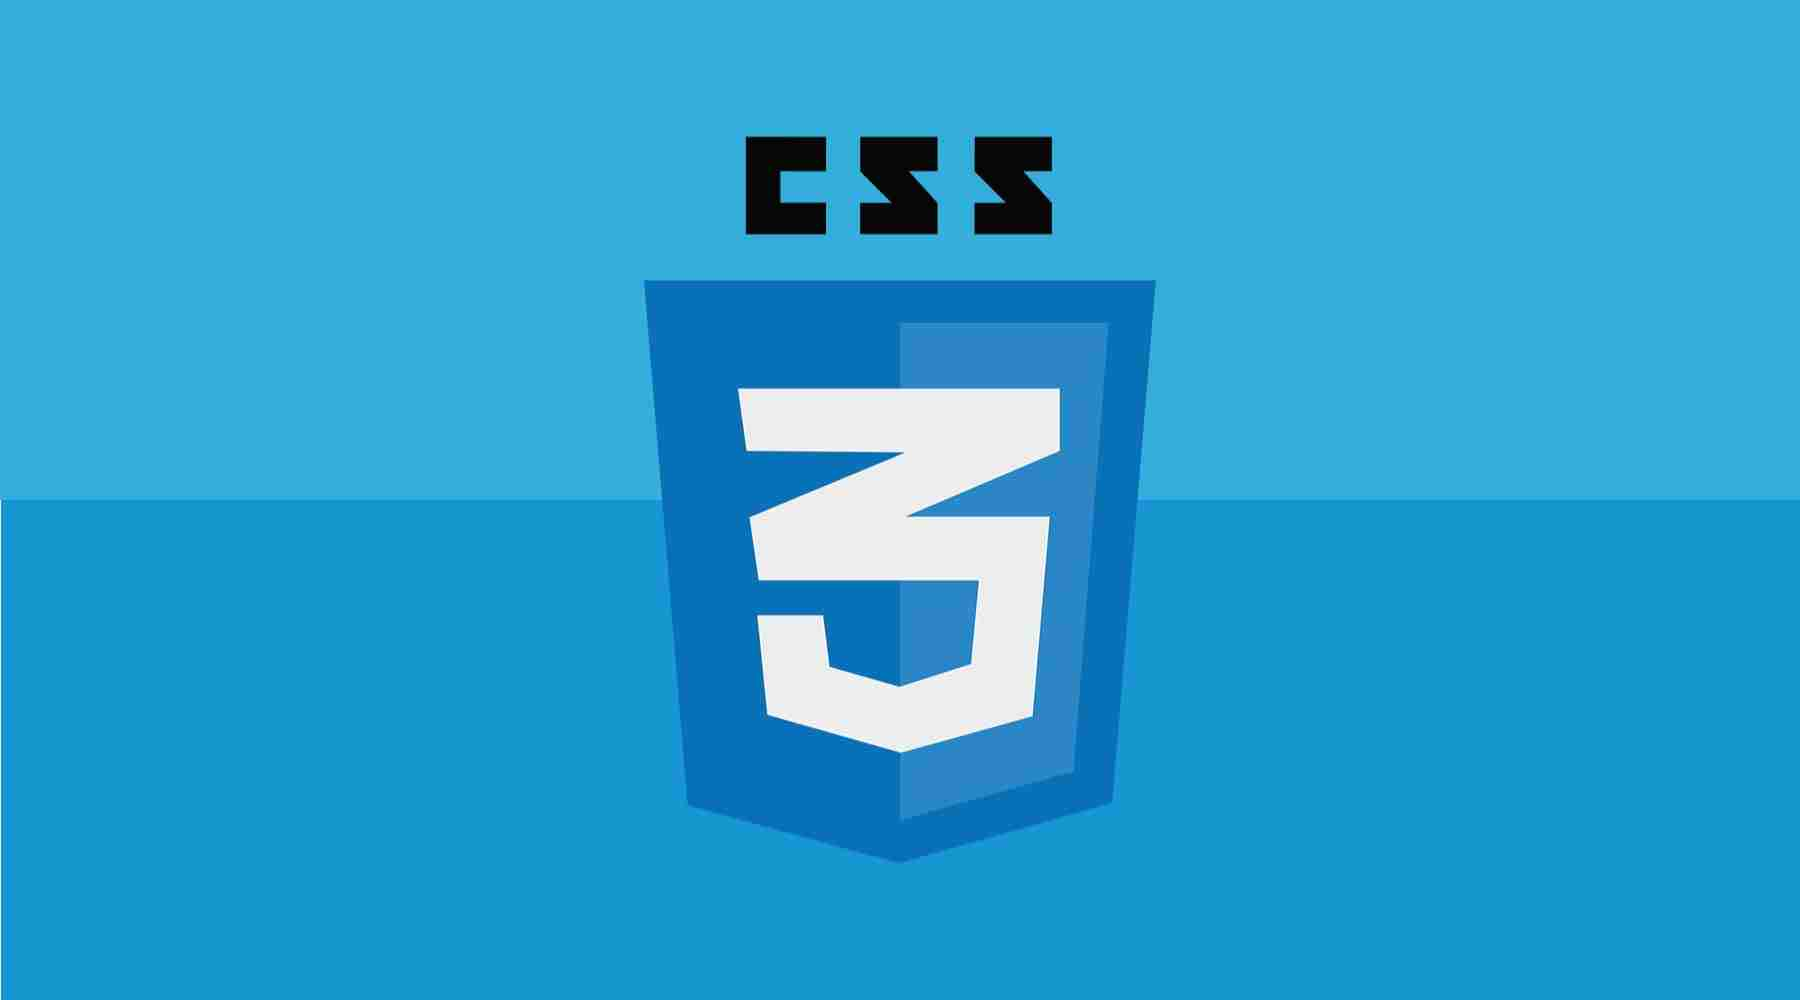 CSS logo banner in web development